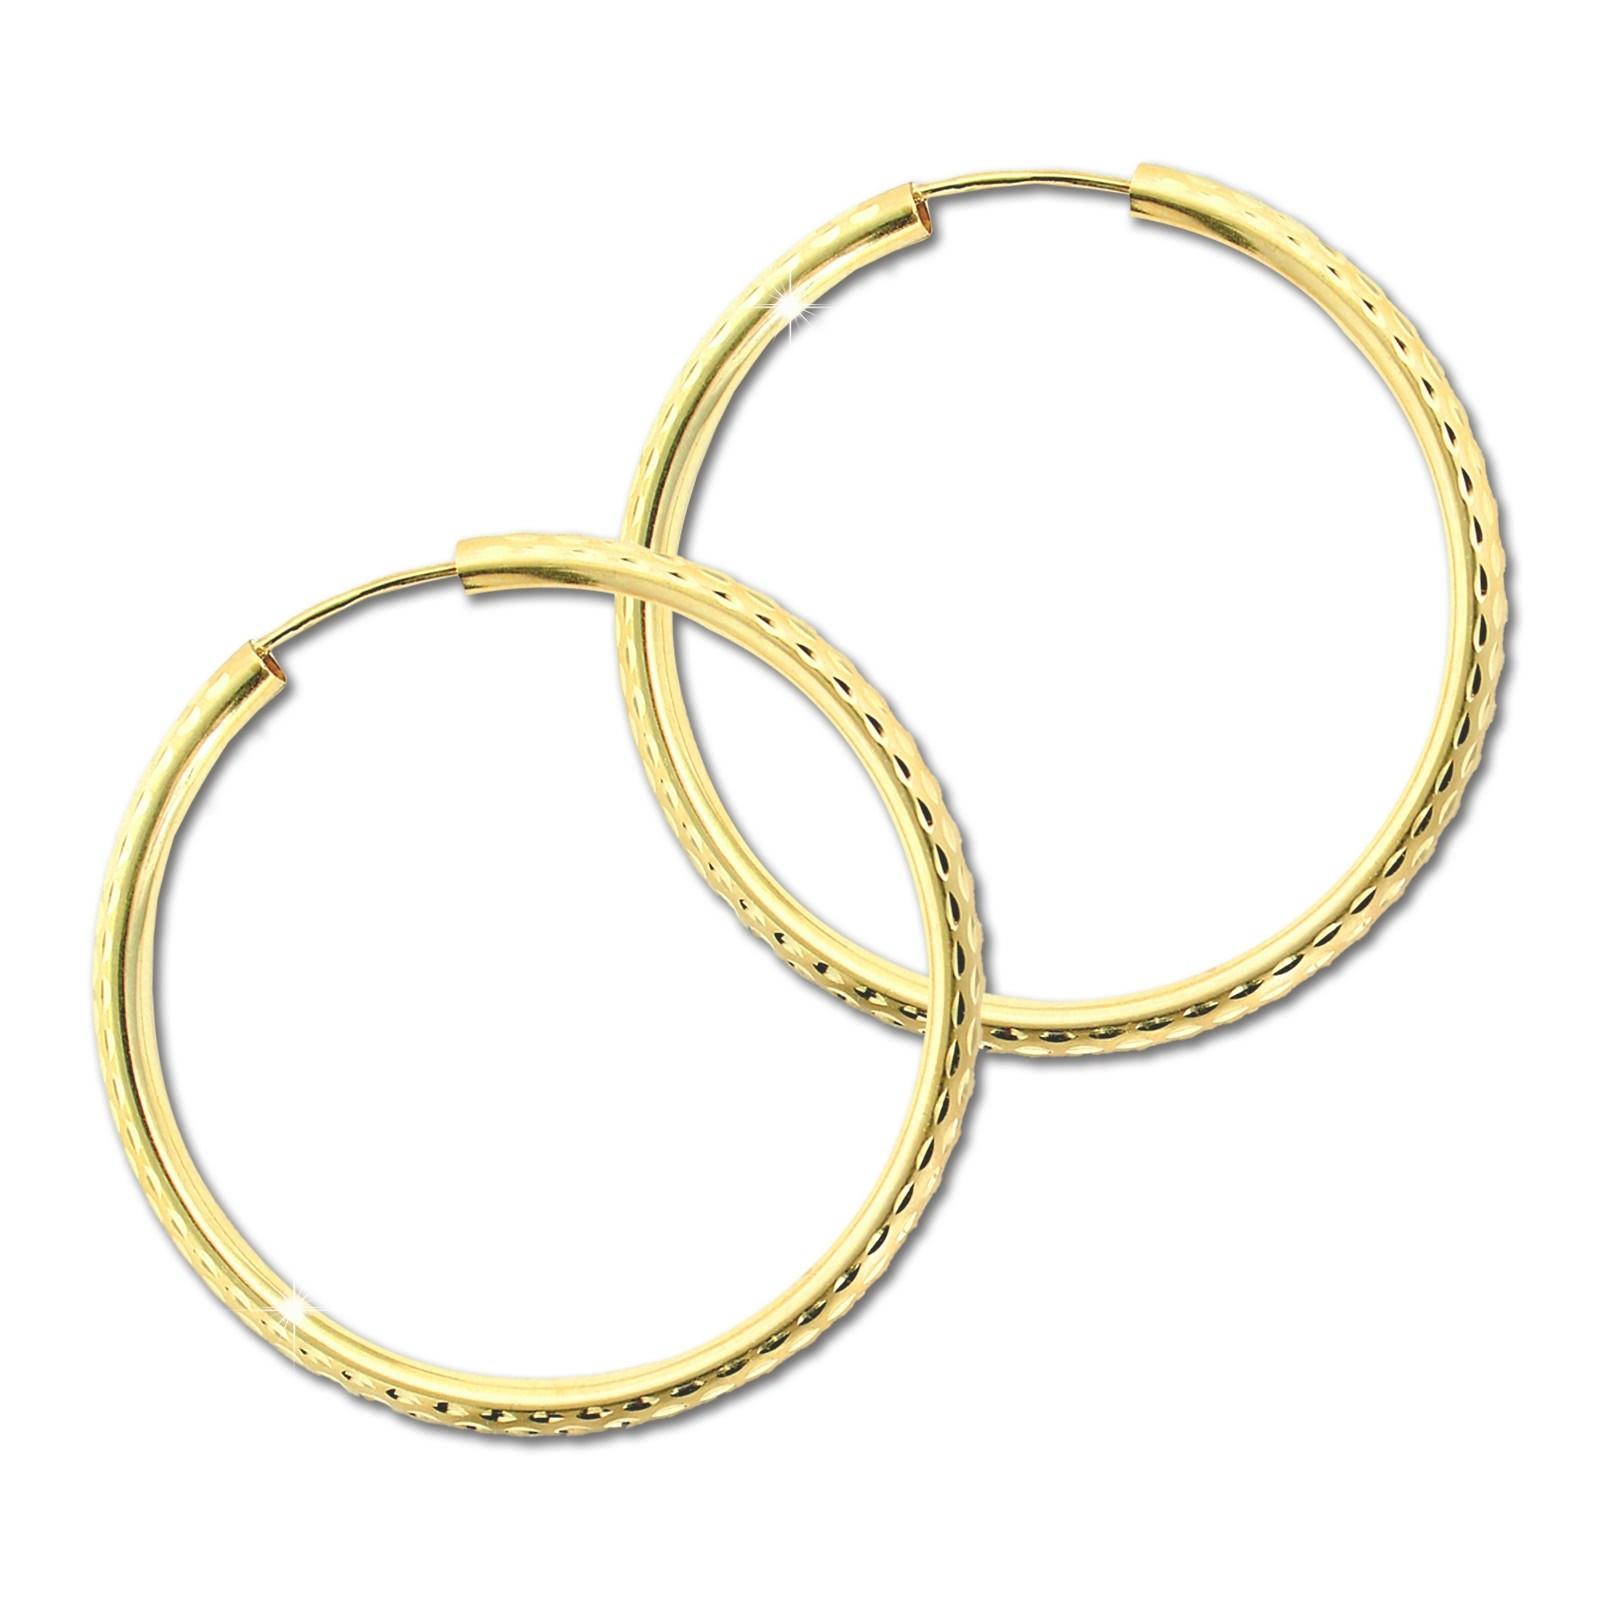 GoldDream Damen Creolen Ohrring 40mm Gelbgold 8 Karat GDOB00440Y